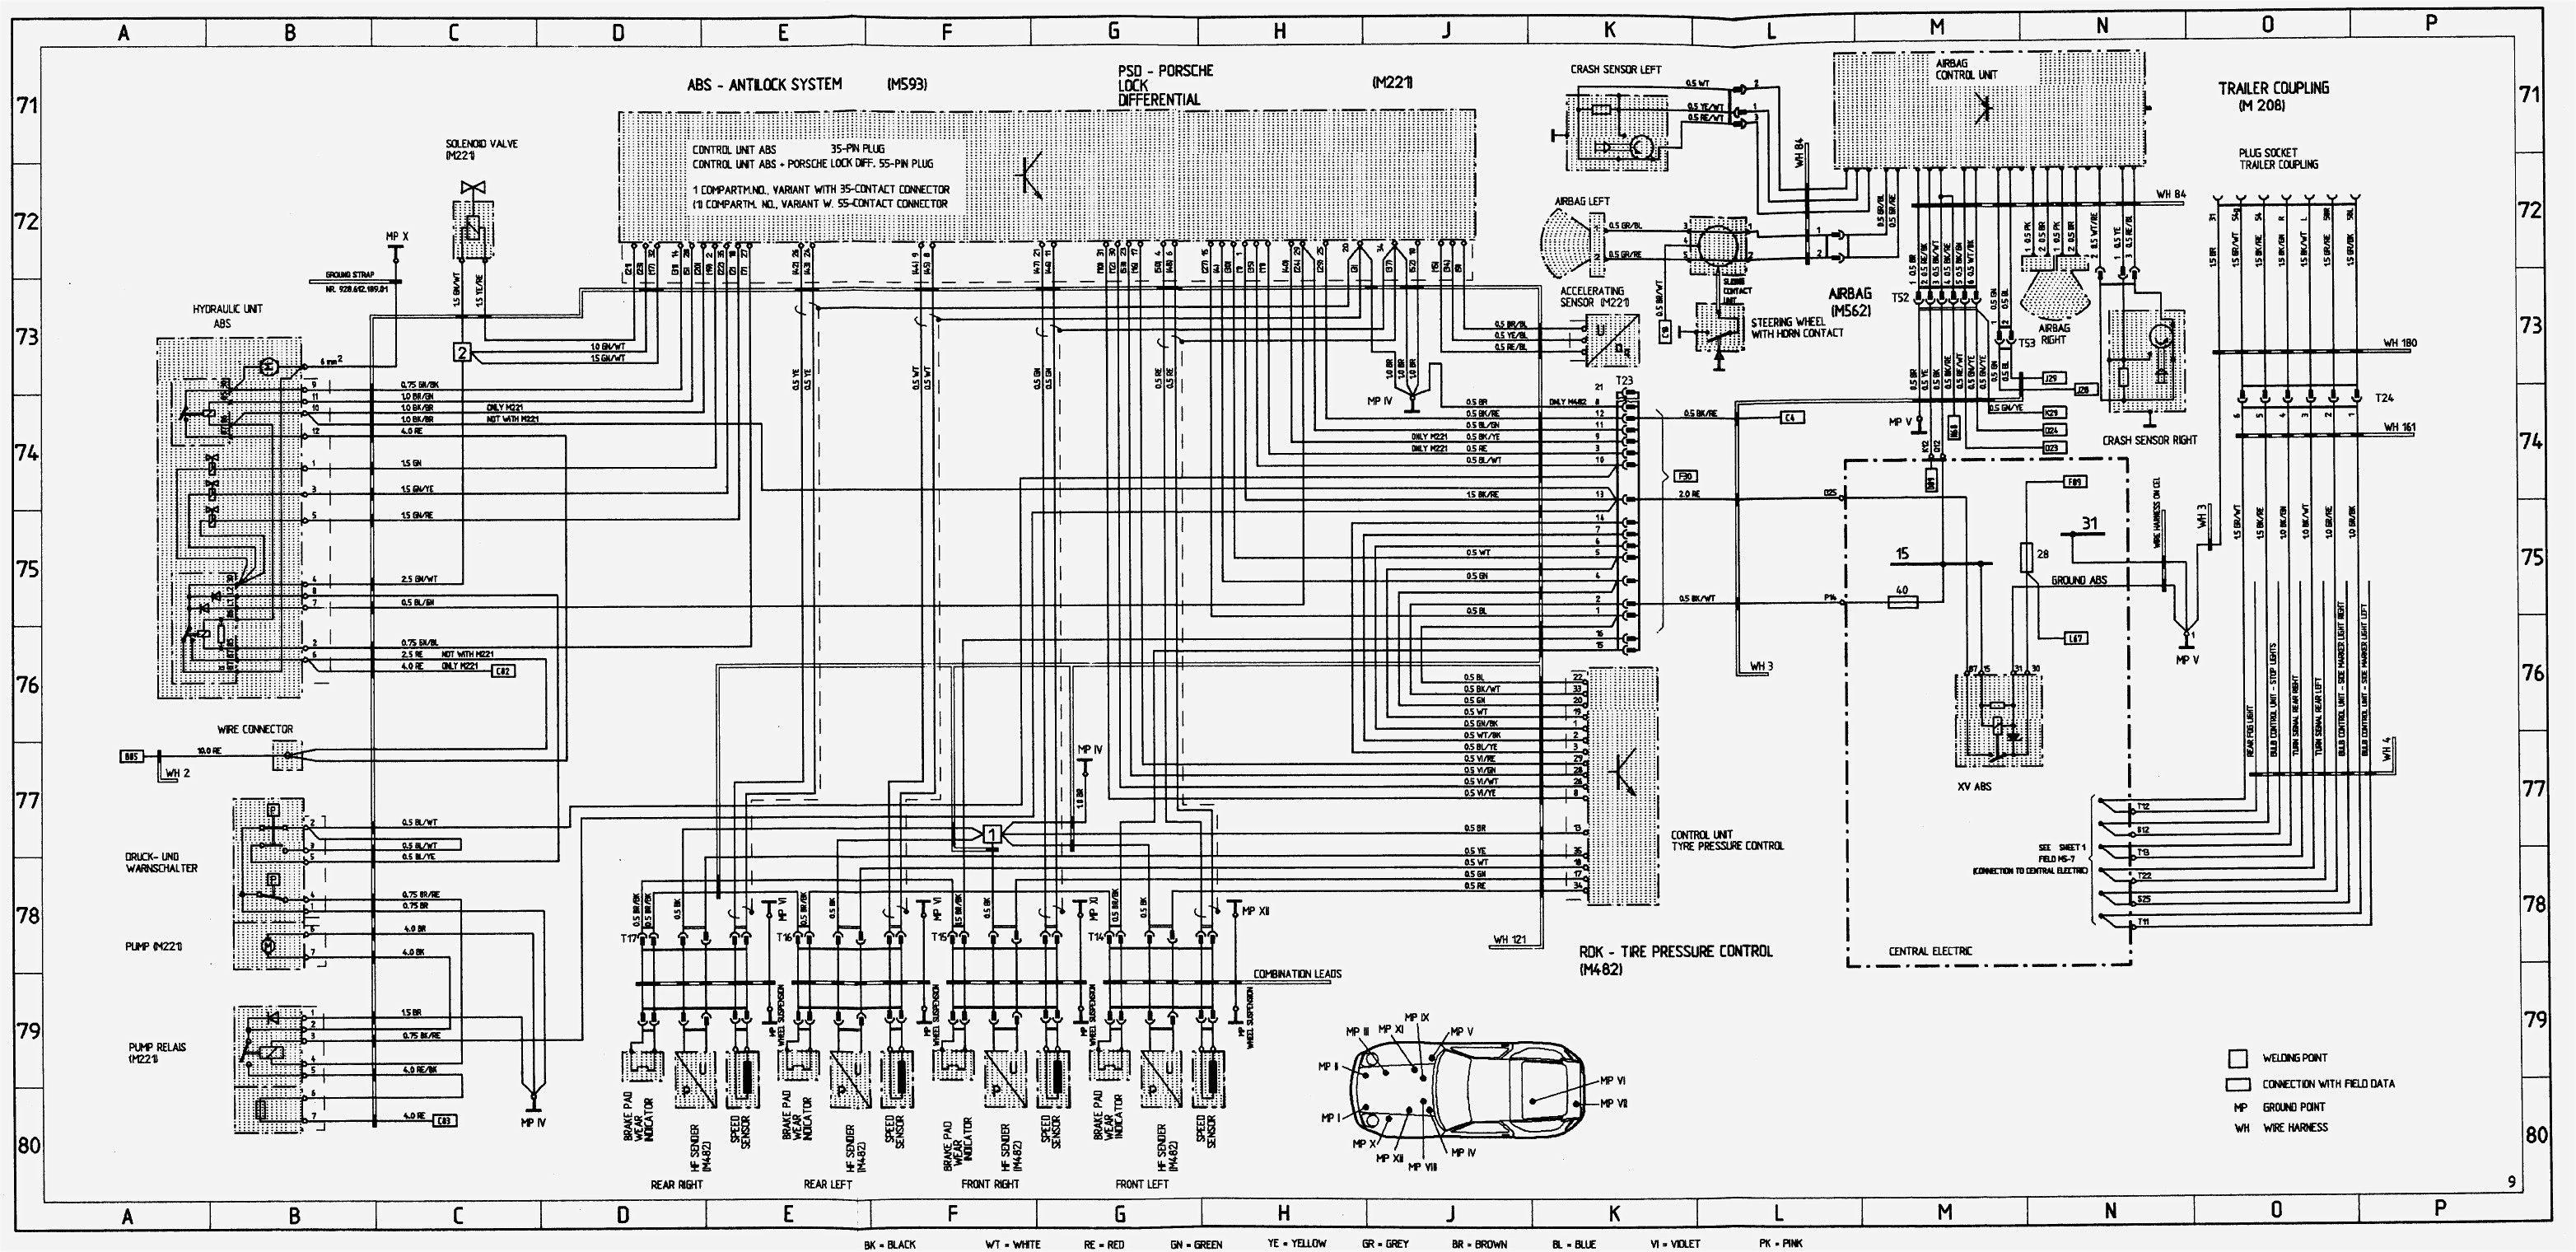 Bmw E36 Wiring Diagram Manual Inspirationa Bmw E36 Wiring